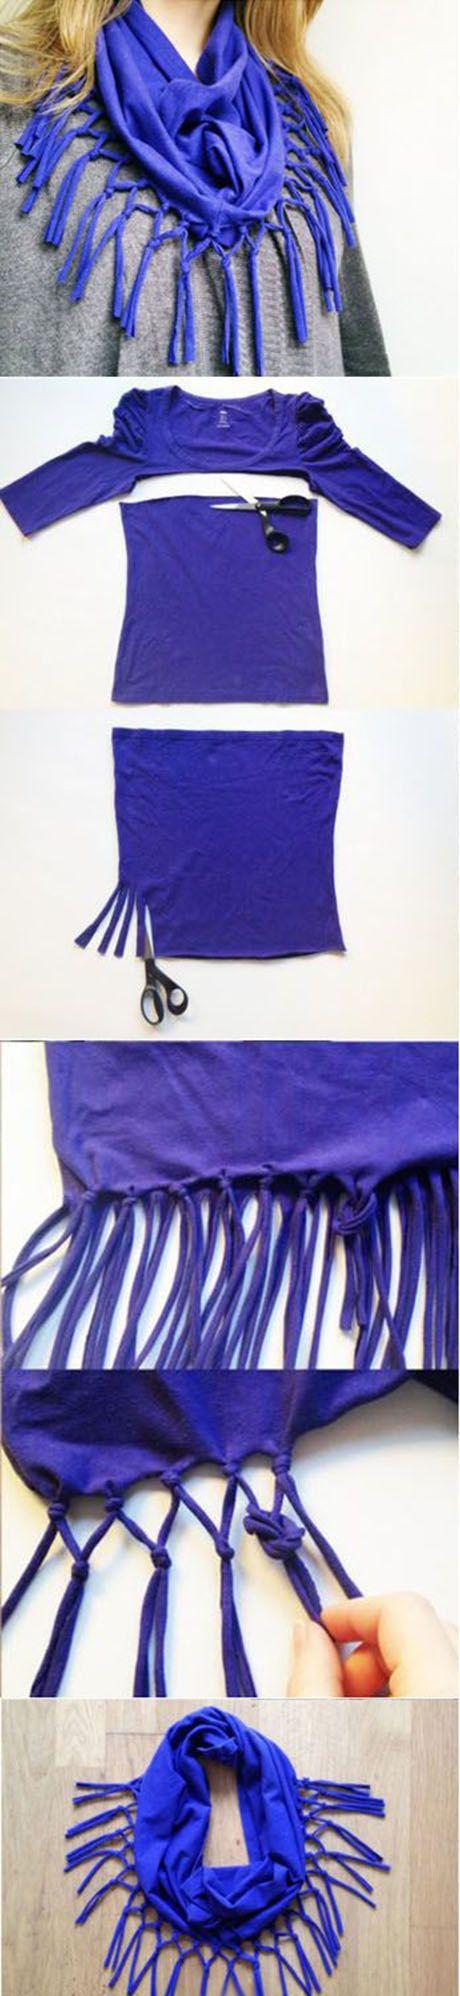 cuello con flecos a partir de camiseta diy textils pinterest schalknoten schals und n hen. Black Bedroom Furniture Sets. Home Design Ideas